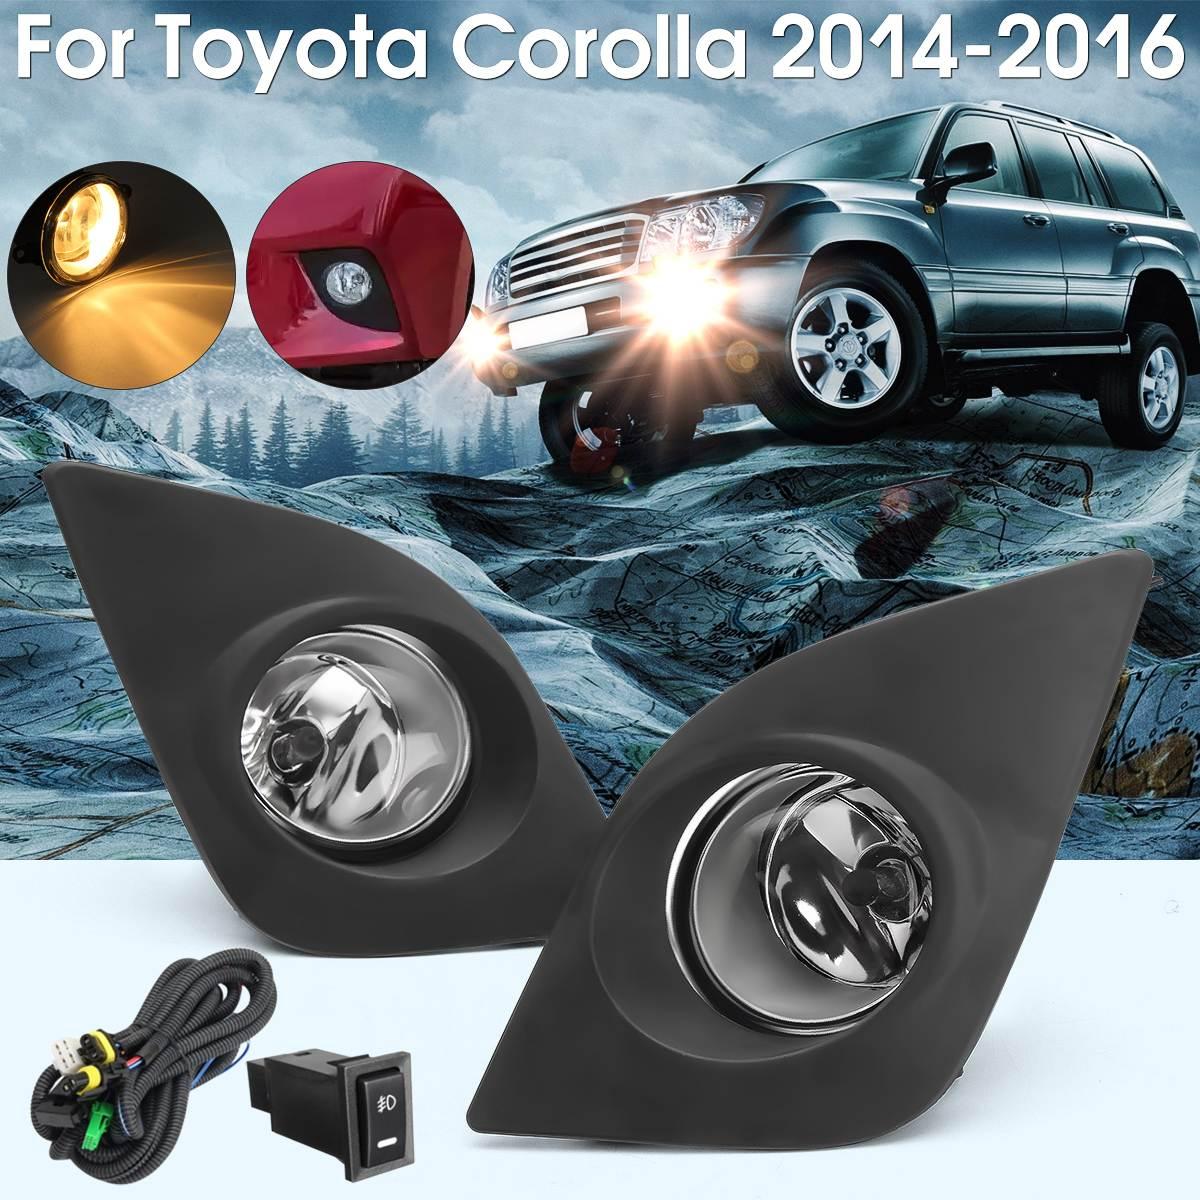 R+L Front Fog Lamp Car Bumper Fog Light W/ H11 Bulbs Wiring Switch Cover For Toyota Corolla 2014 2015 2016 front bumper convex lens fog light for vw touran 1t1 1t2 l 1t0941699 r 1t0941700 foglamps